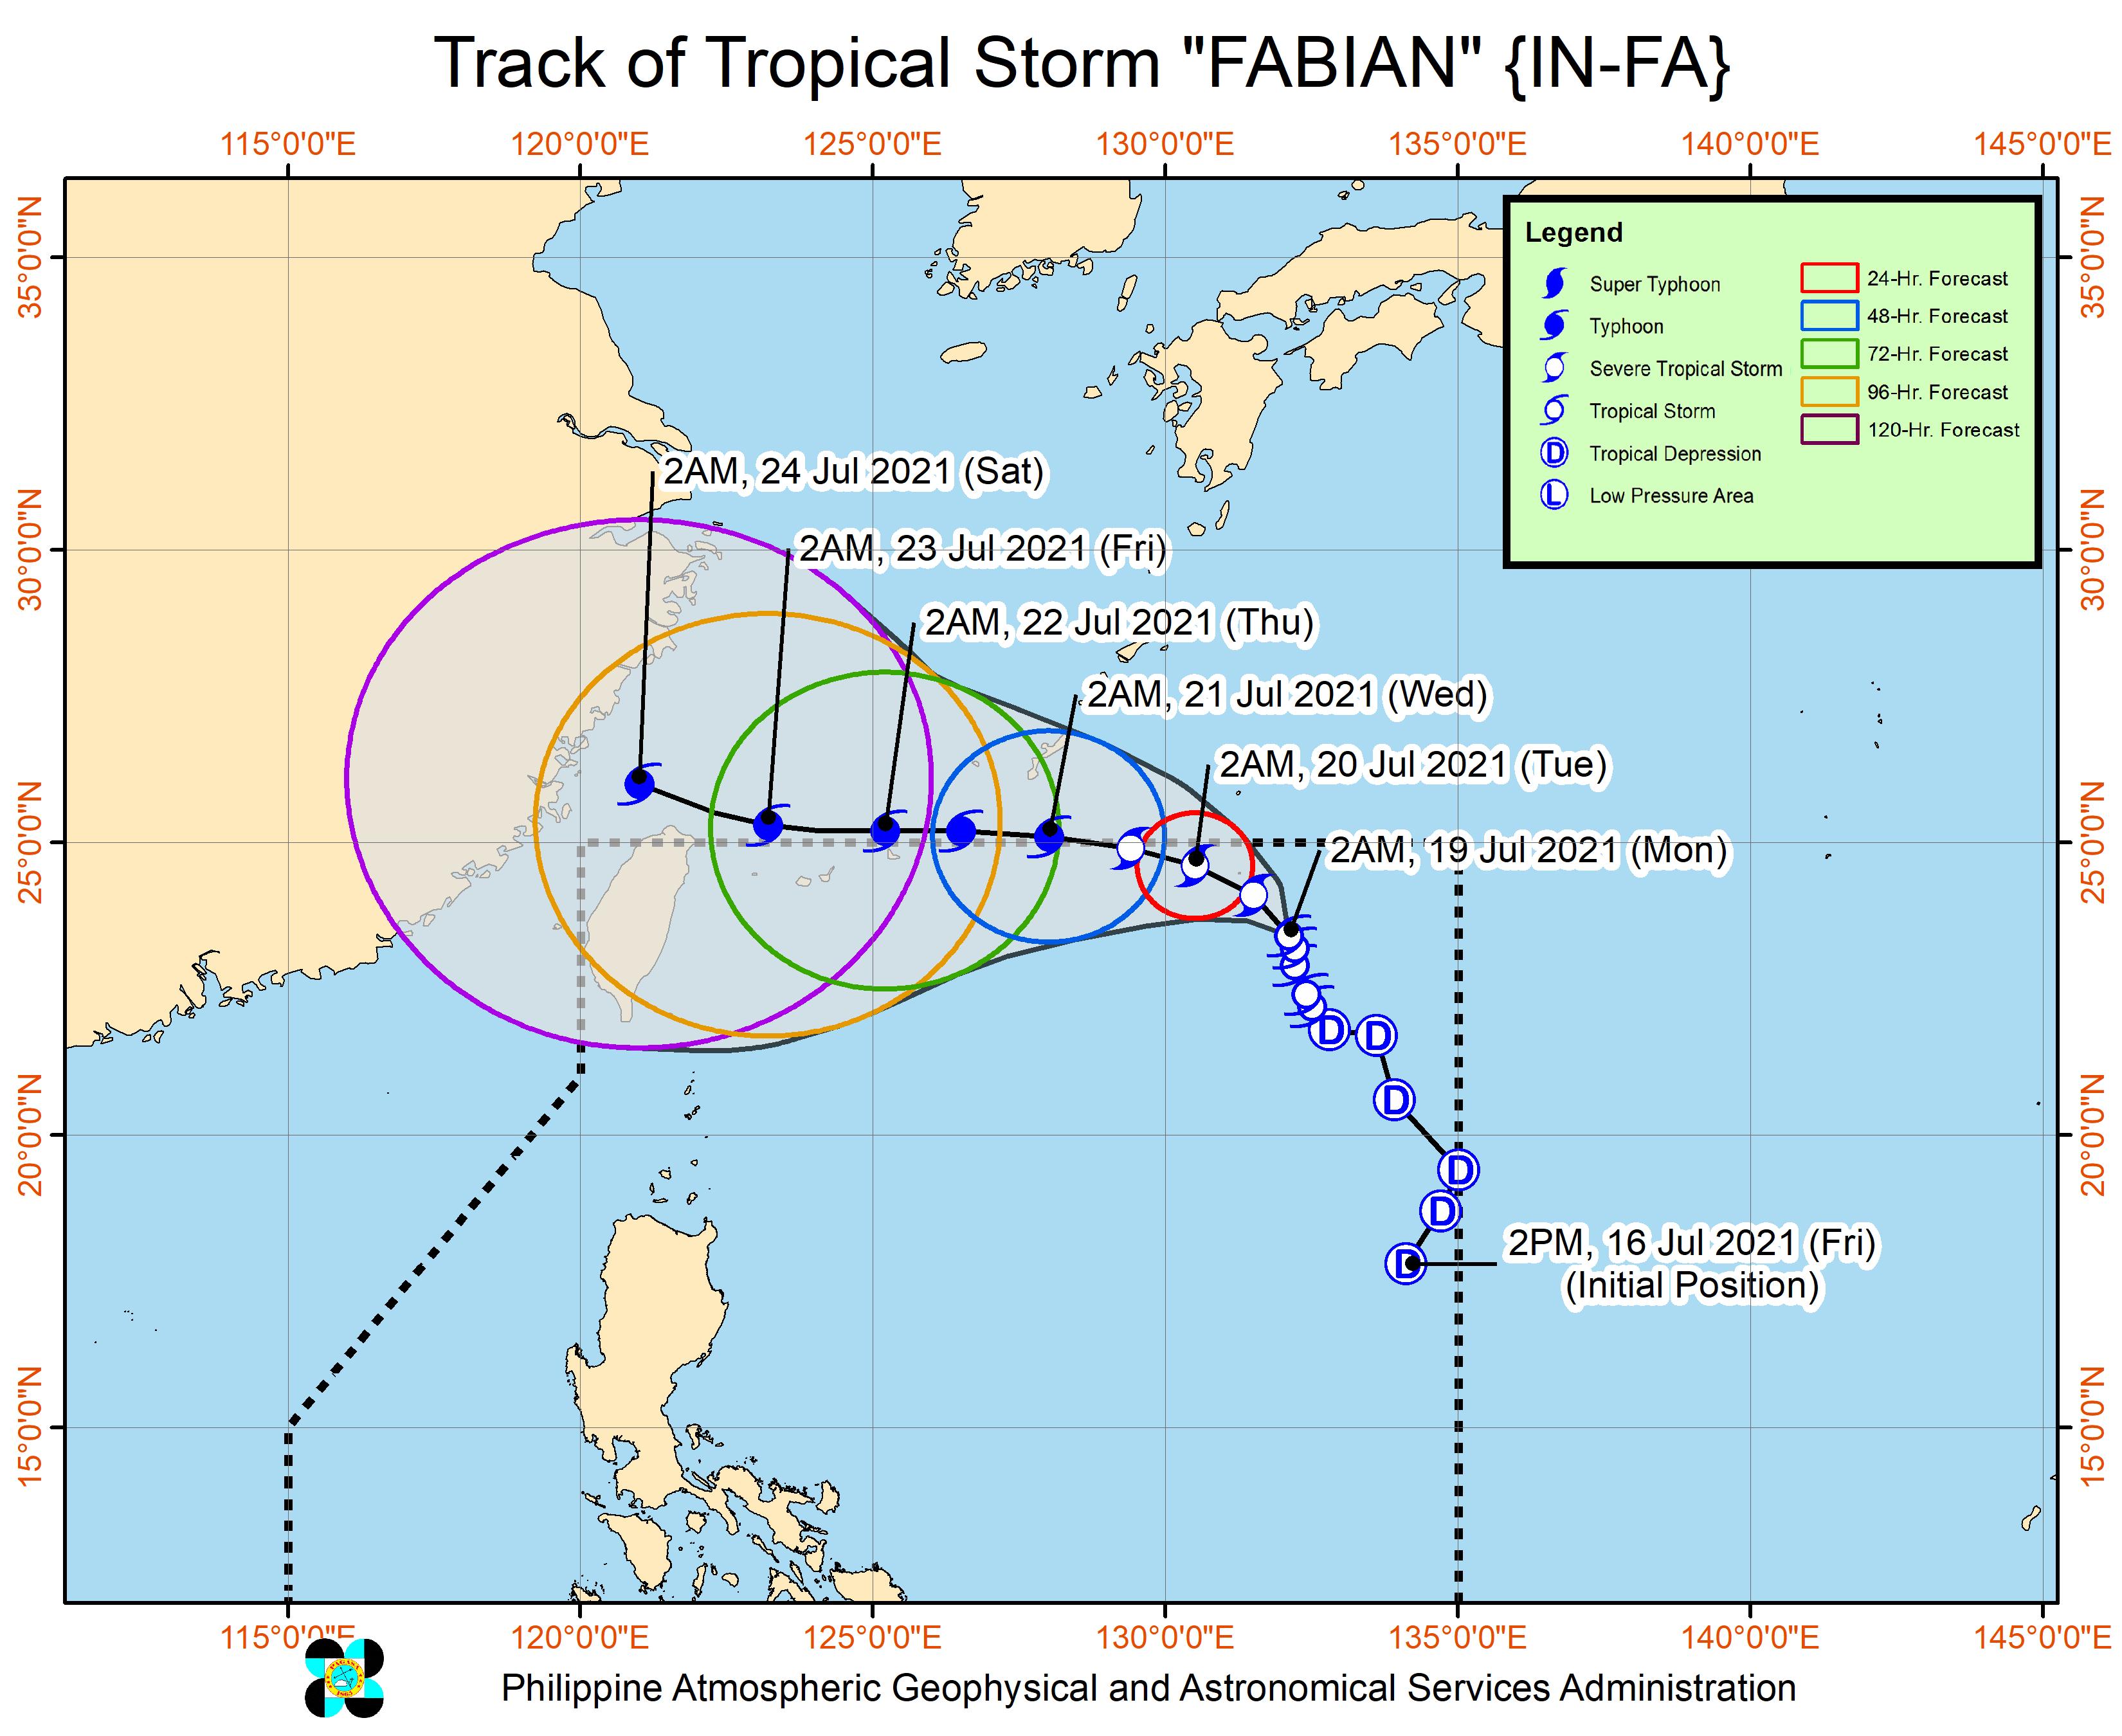 Fabian intensifies, nears severe tropical storm category 1